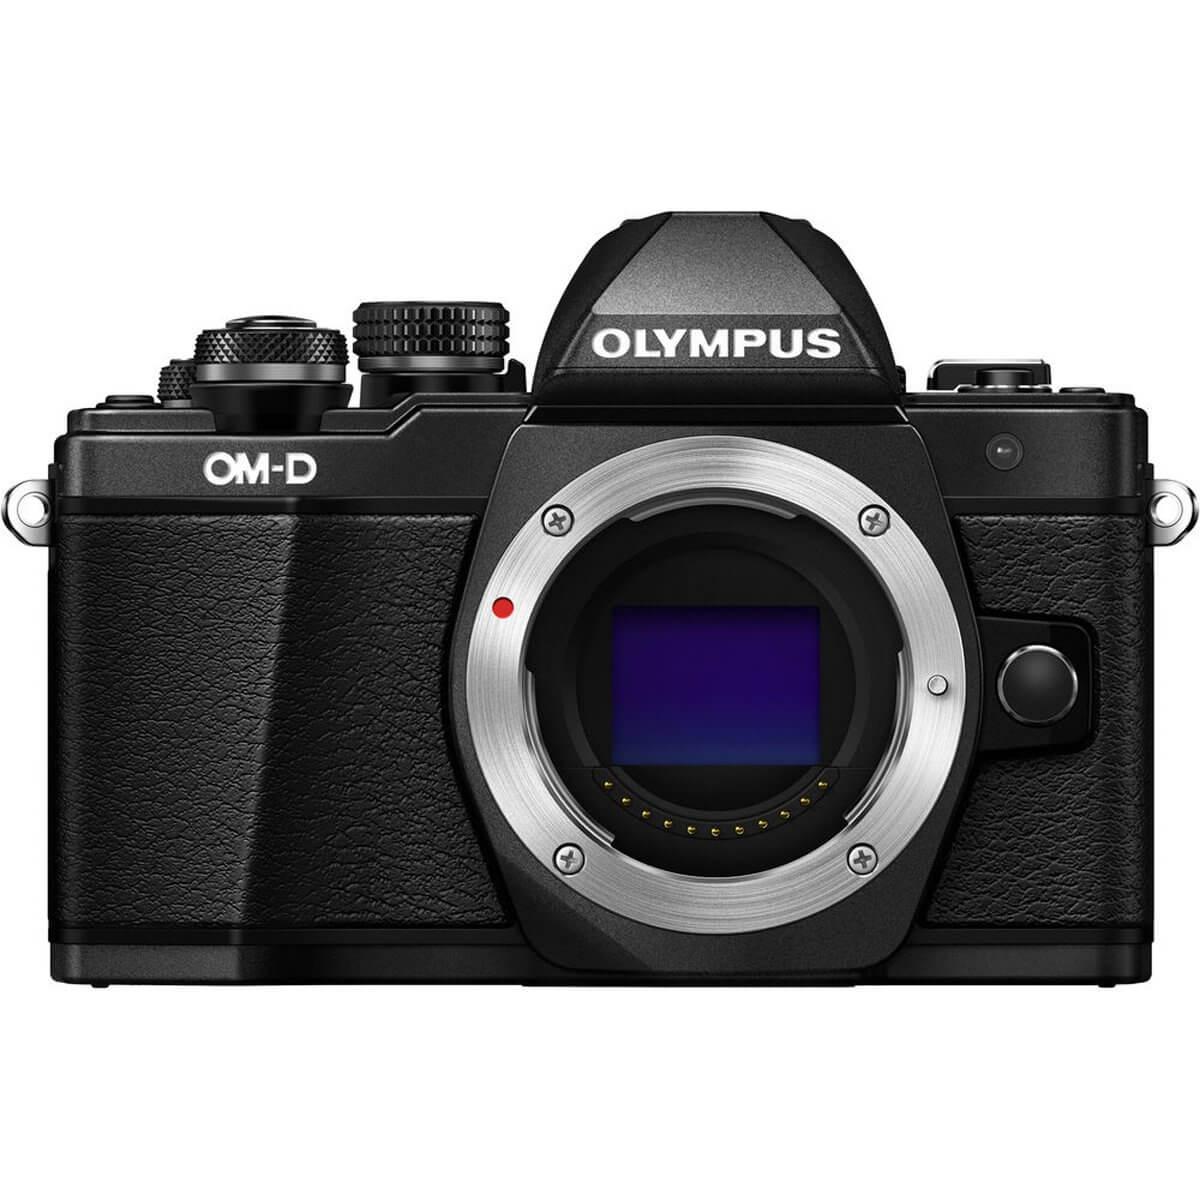 Olympus OM-D E-M10 Mark II Body Black (ประกันศูนย์)